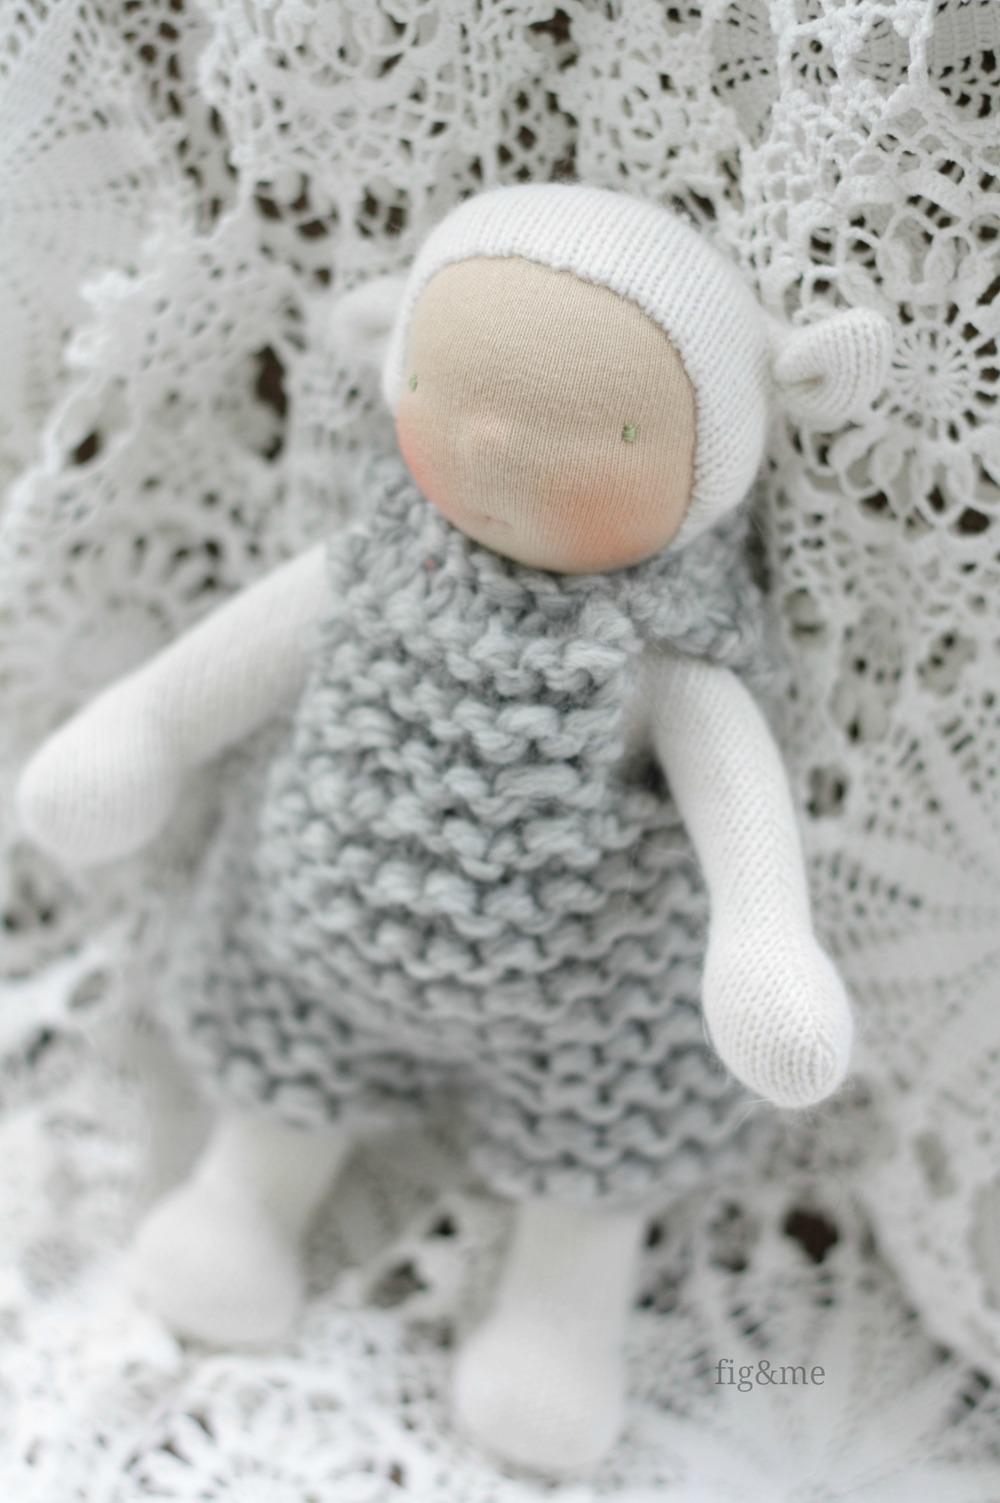 Little Bridgit Dorset, by Fig&me.